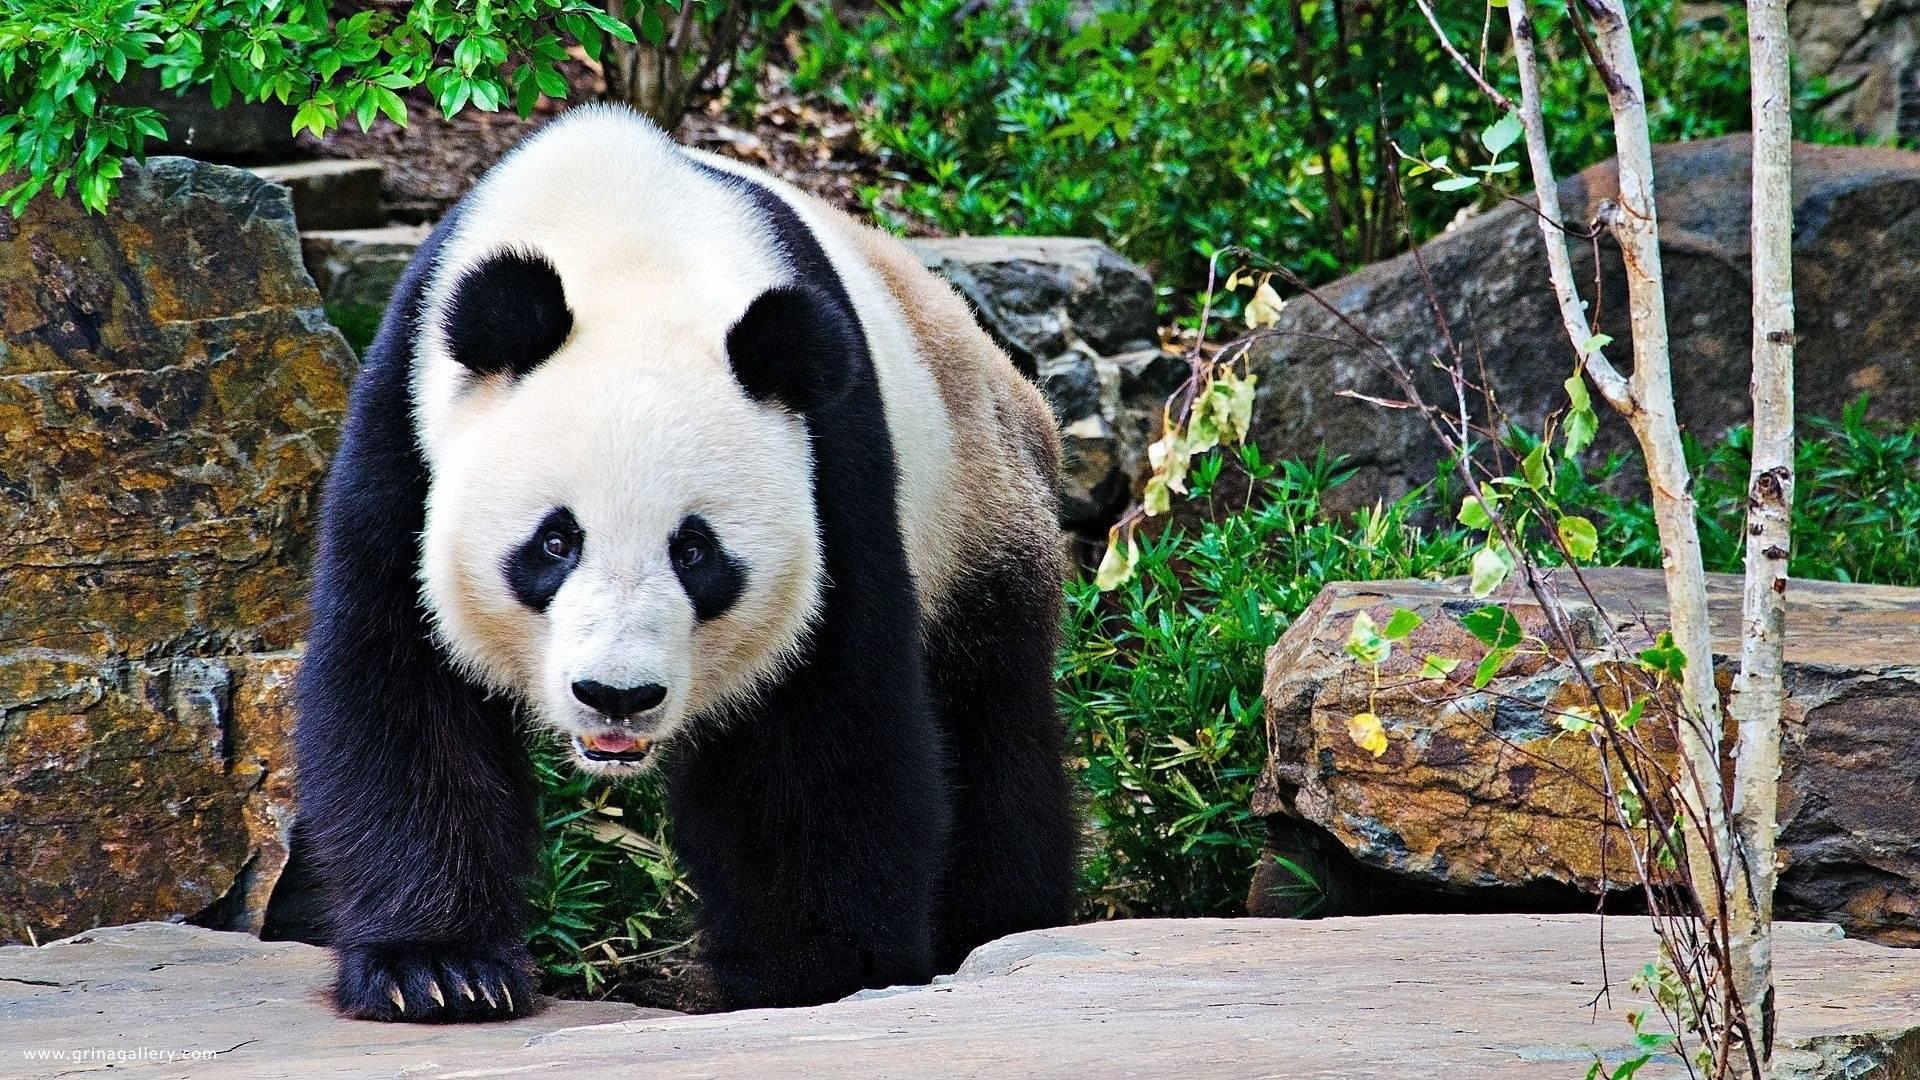 Panda bear wallpaper Wide or HD | Animals Wallpapers